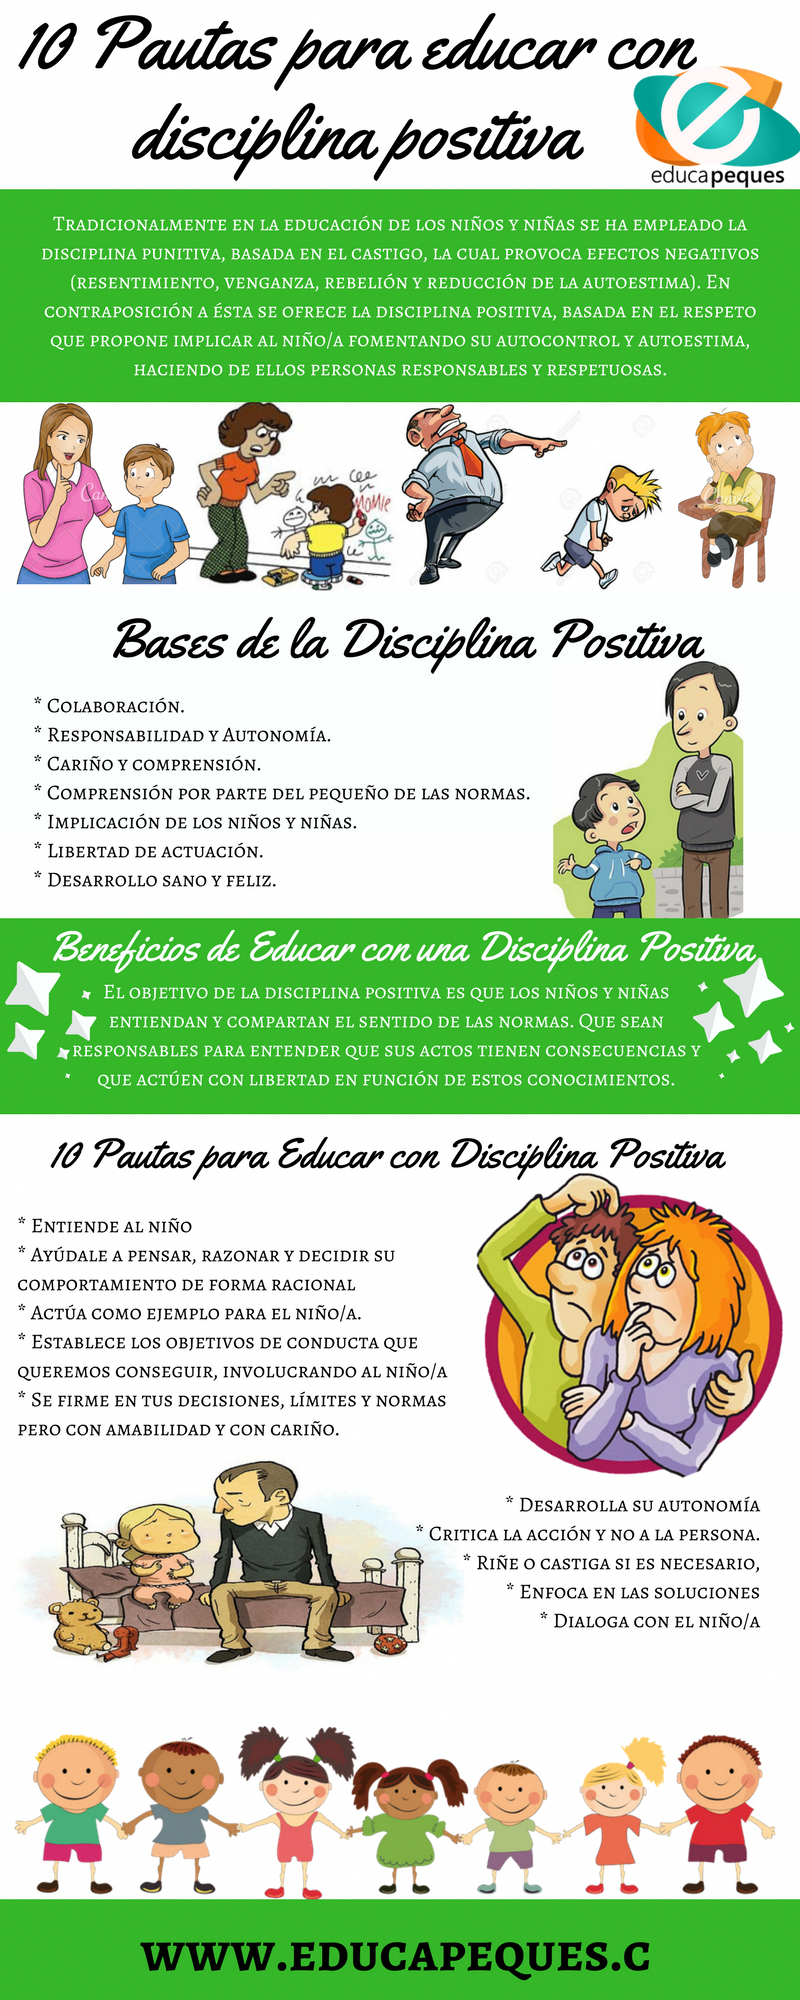 Frases Para La Gente Q Te Escribe Cuando Quiere In 2020 Kid Education Teaching Spanish Lessons For Kids Kids Education